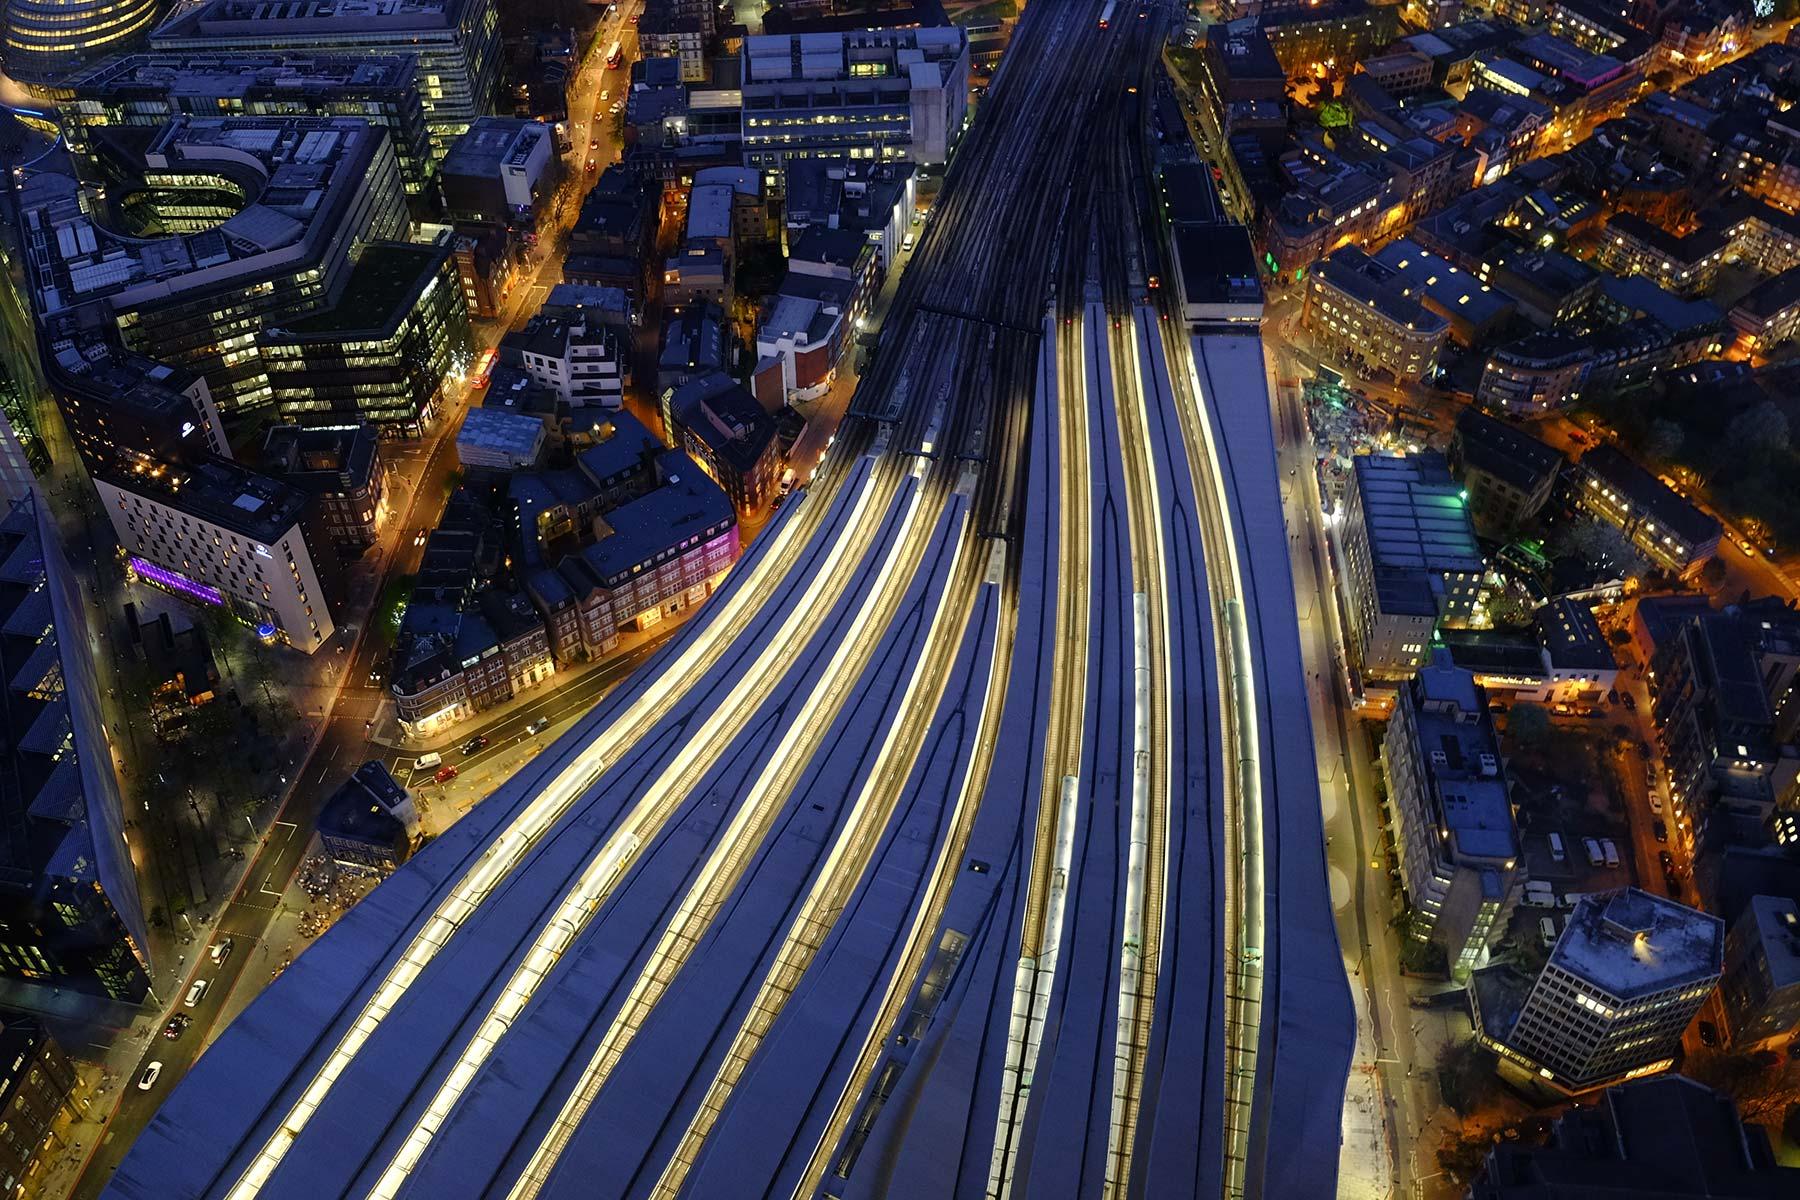 Nacht Blick vom The Shard in London, England